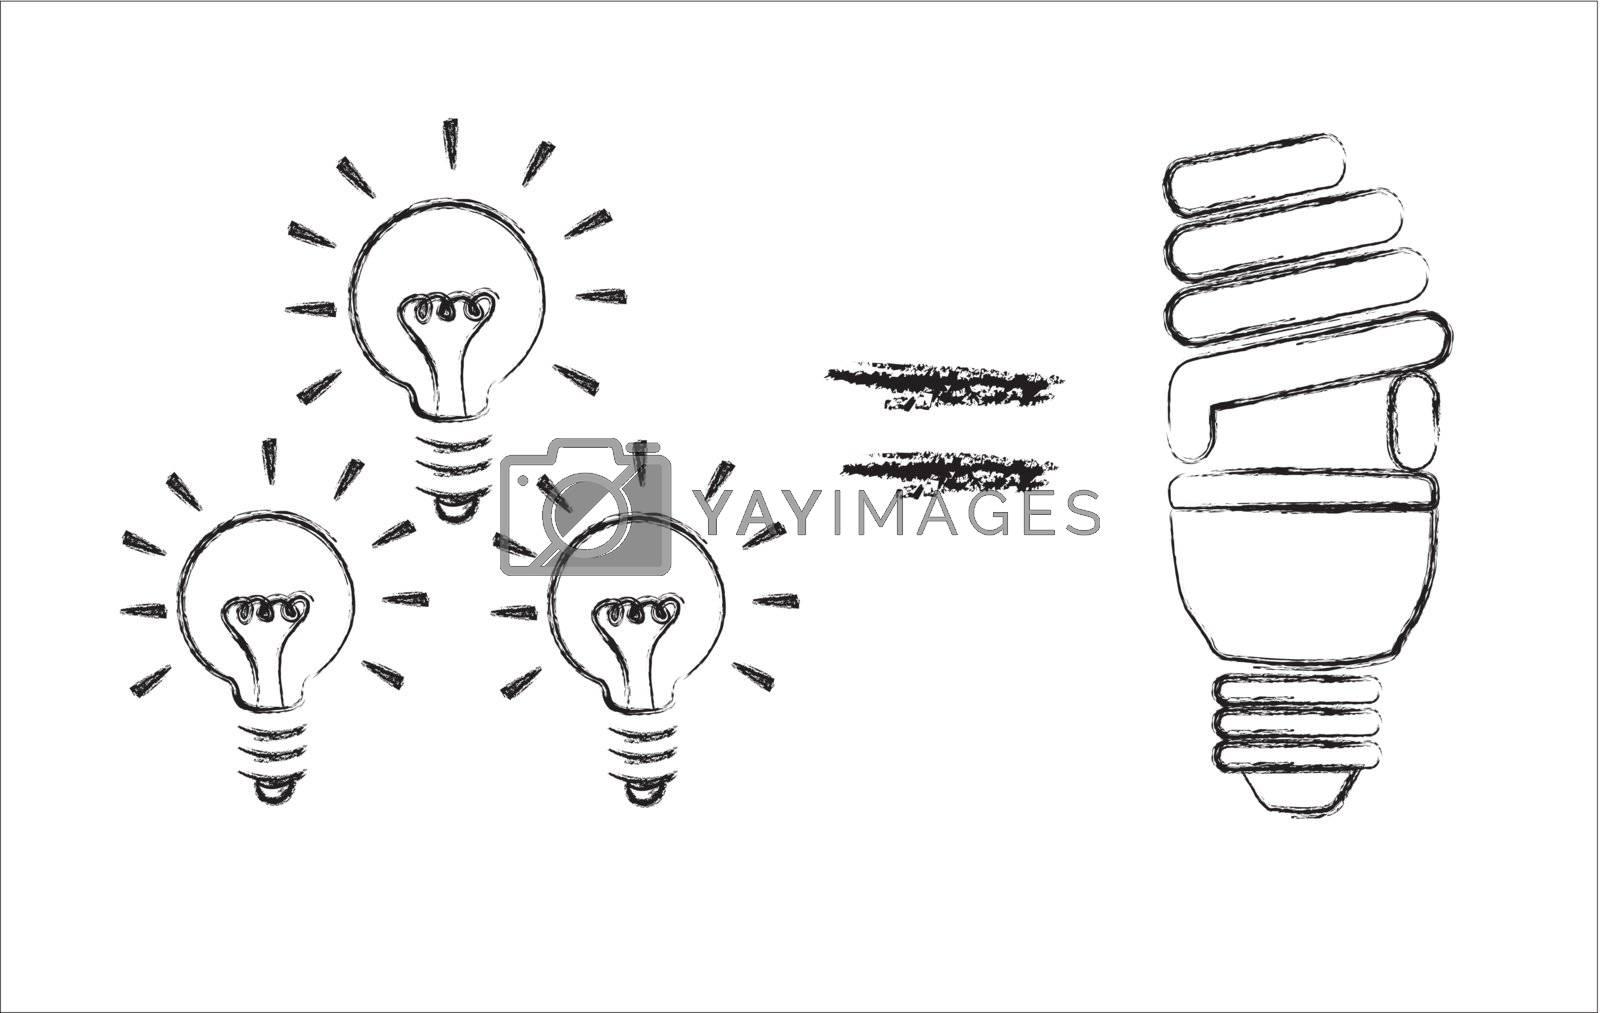 calculation of savings among older bulbs and ecological